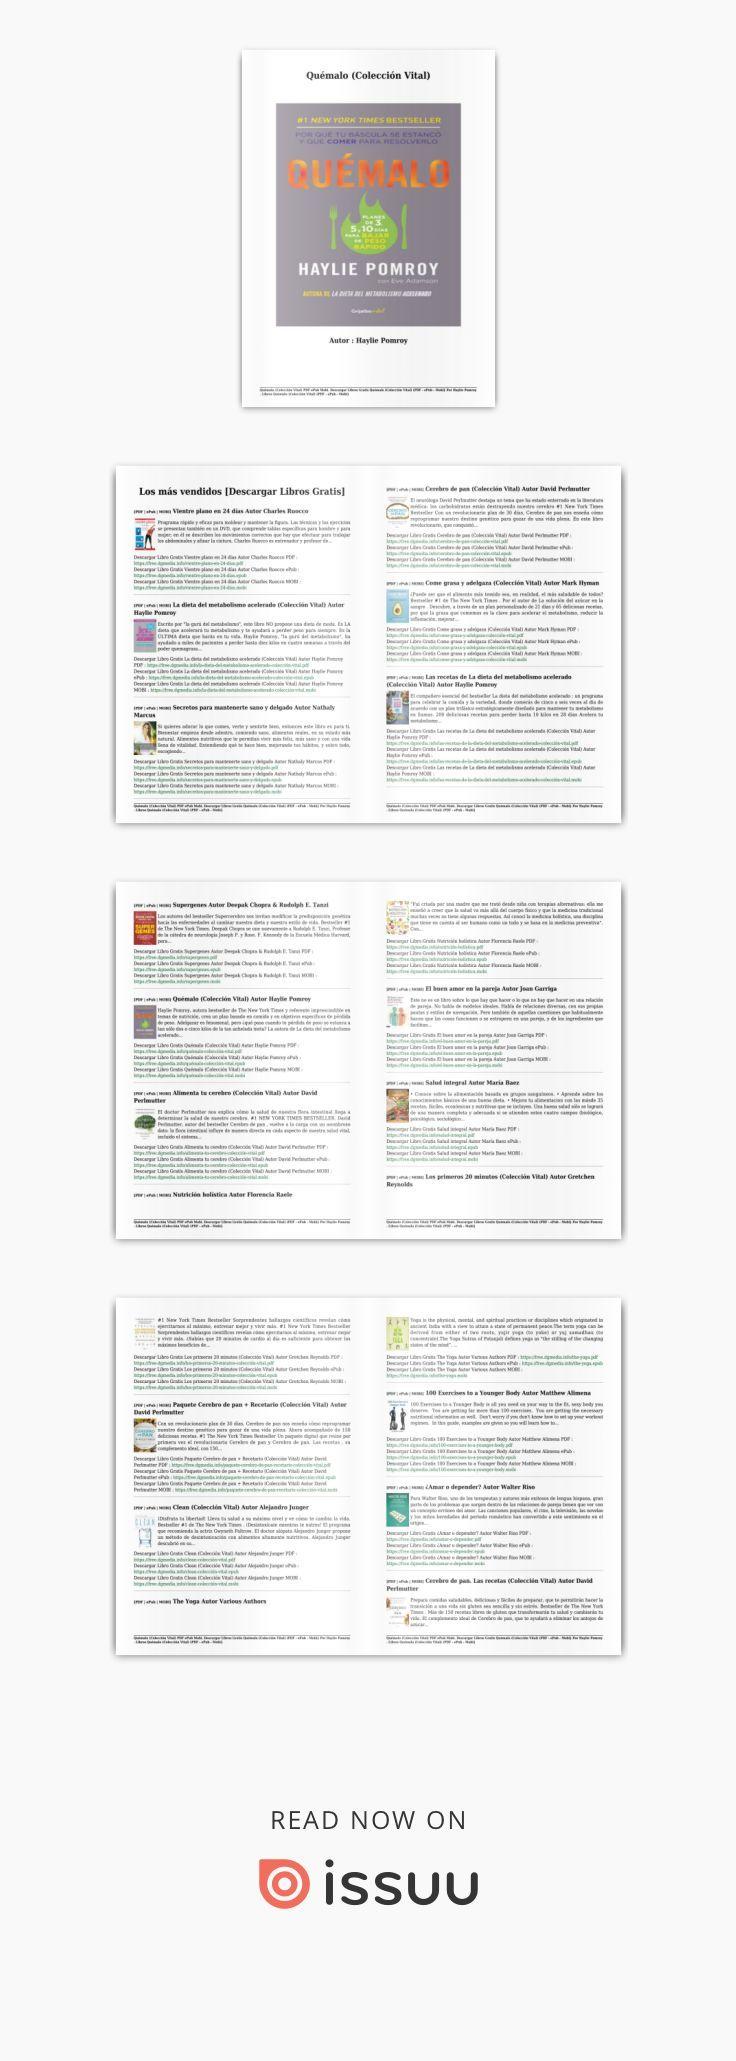 Dieta smart pdf descargar